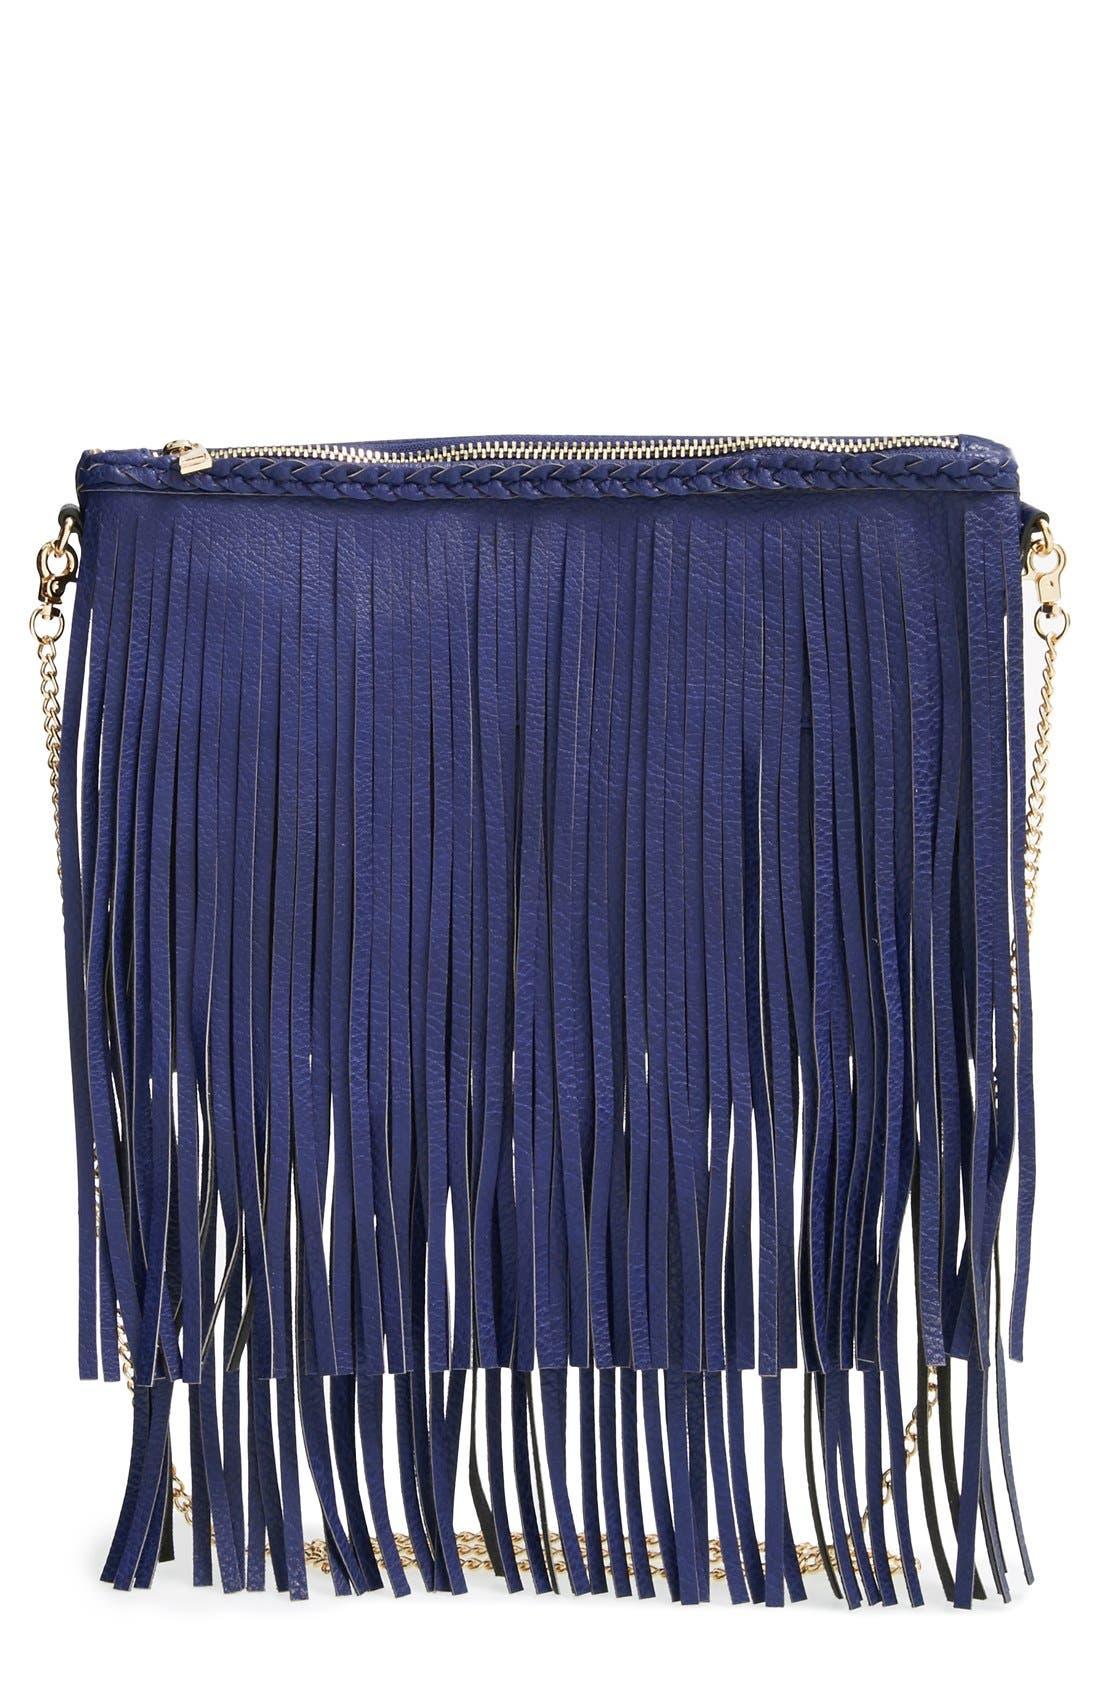 Main Image - Sole Society 'Rose' Fringe Faux Leather Convertible Crossbody Bag